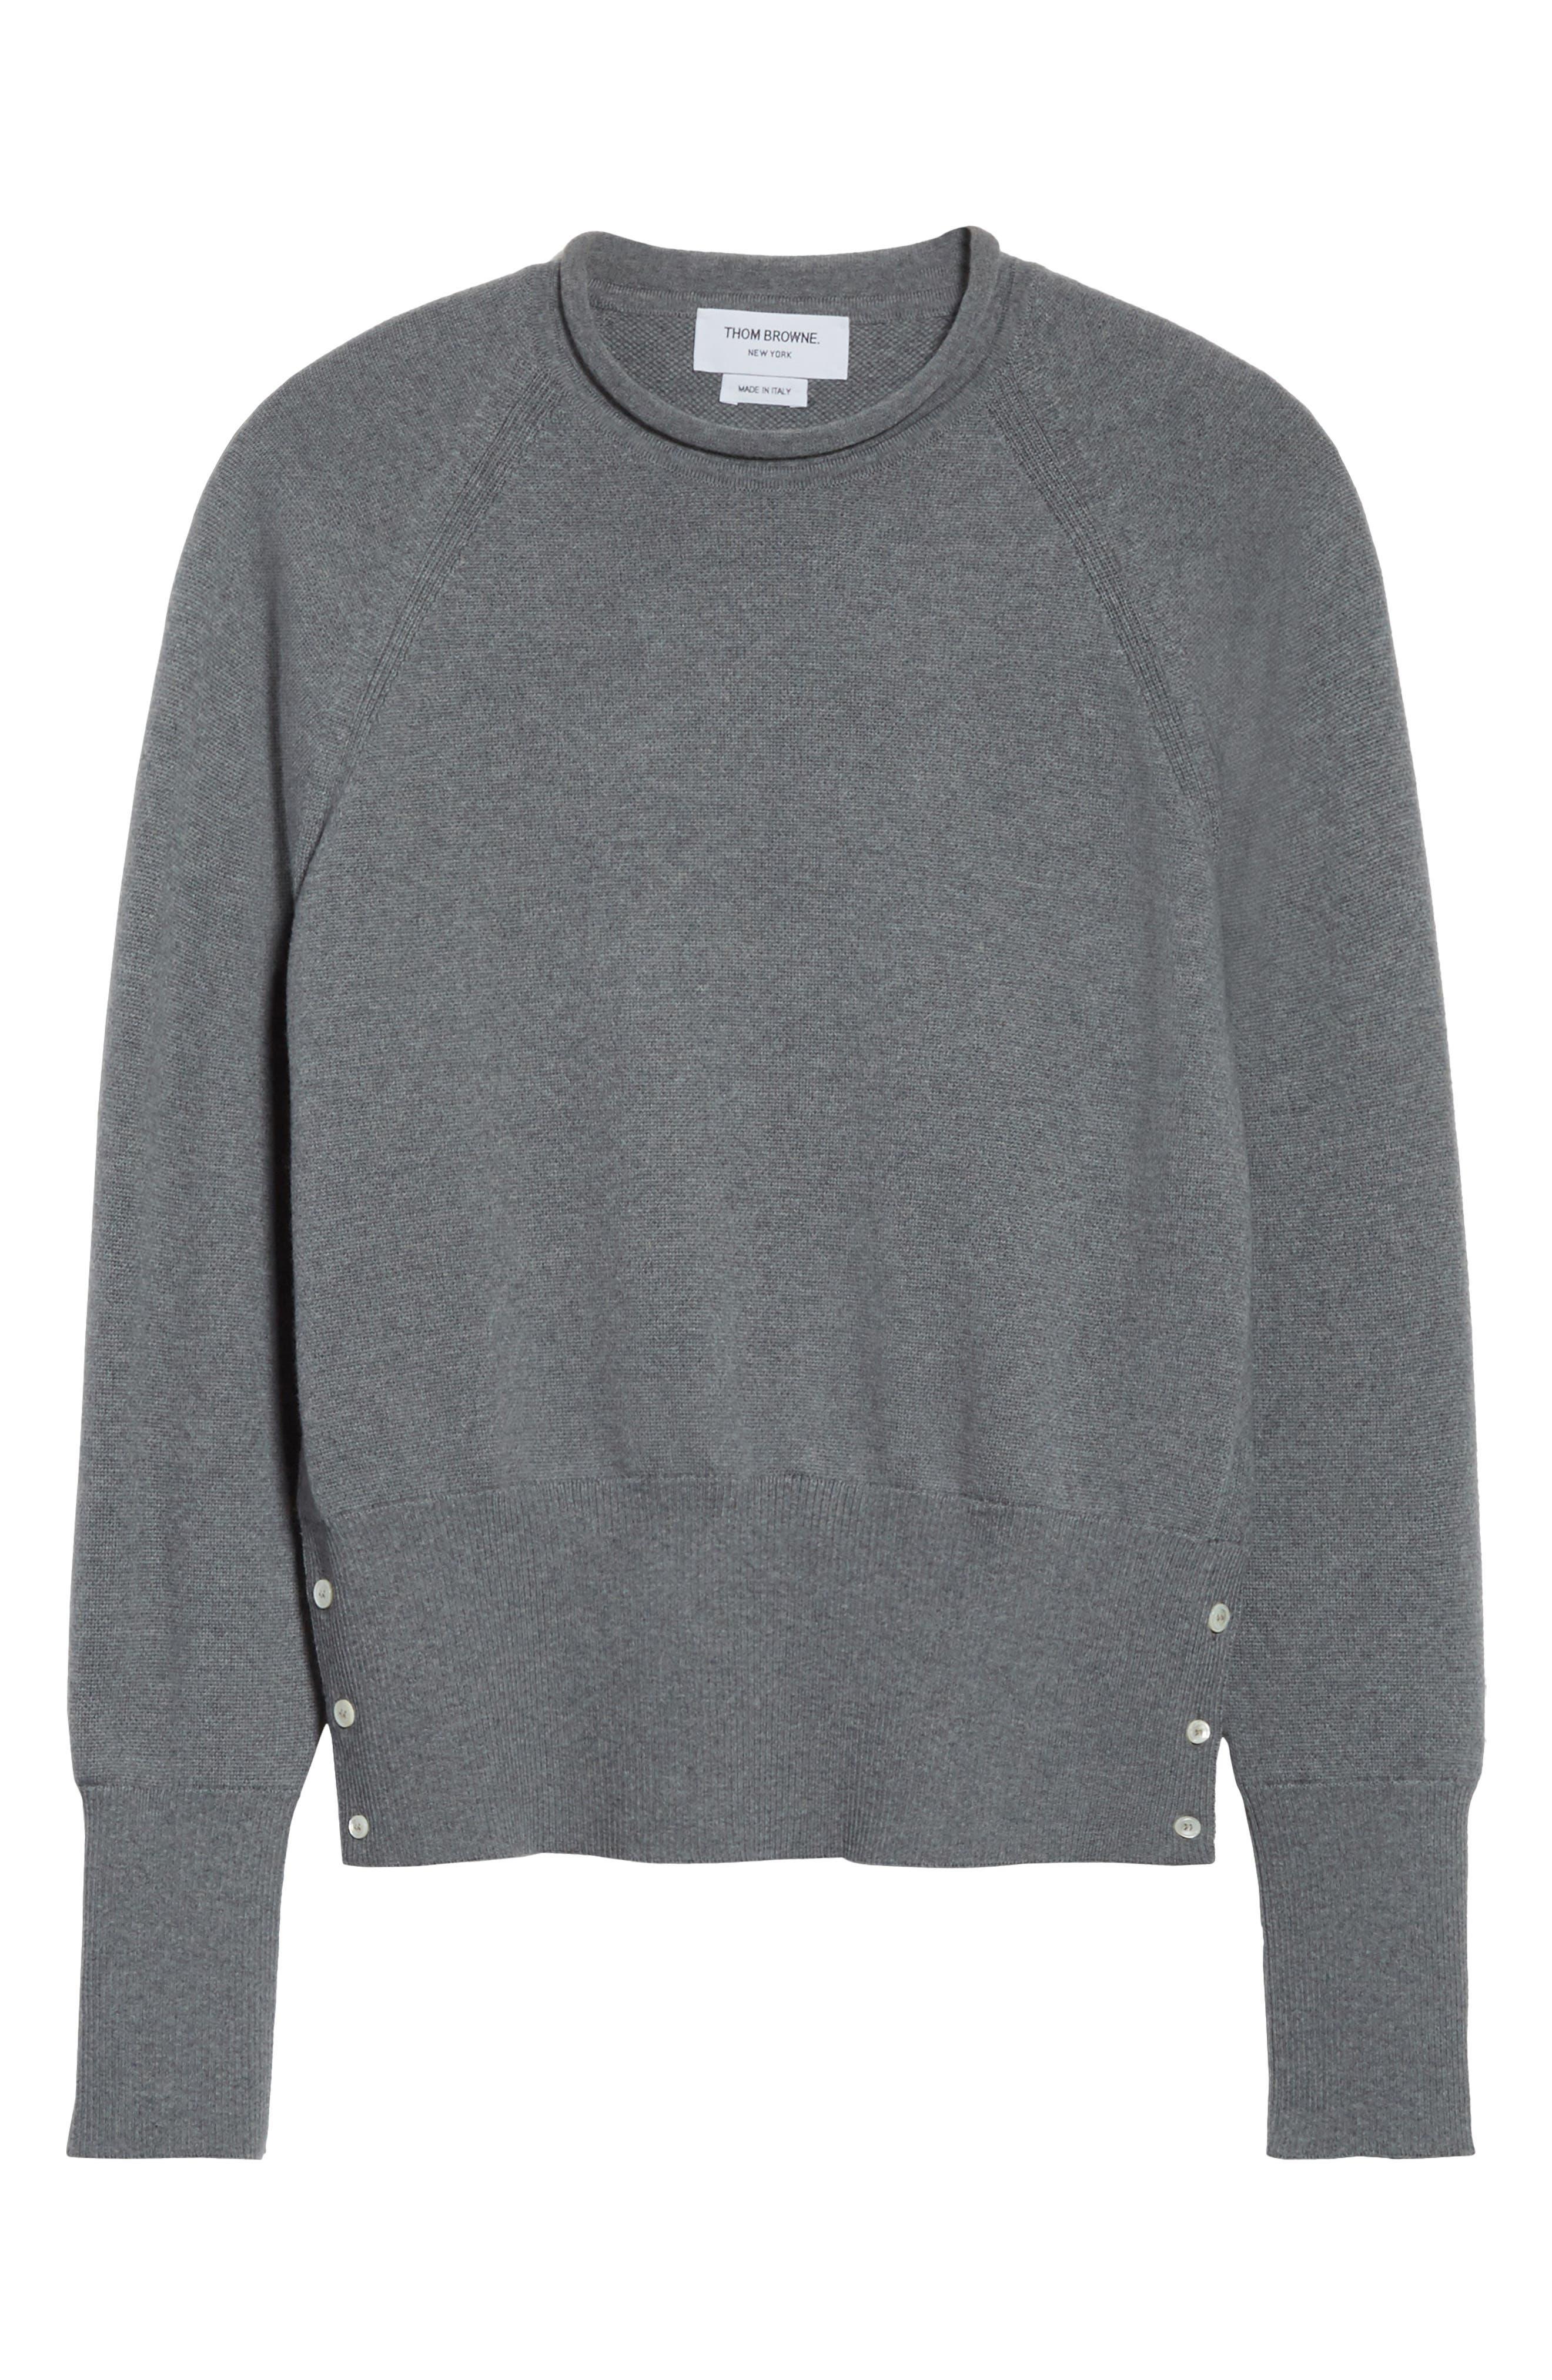 Raglan Merino Wool Sweater,                             Alternate thumbnail 6, color,                             020